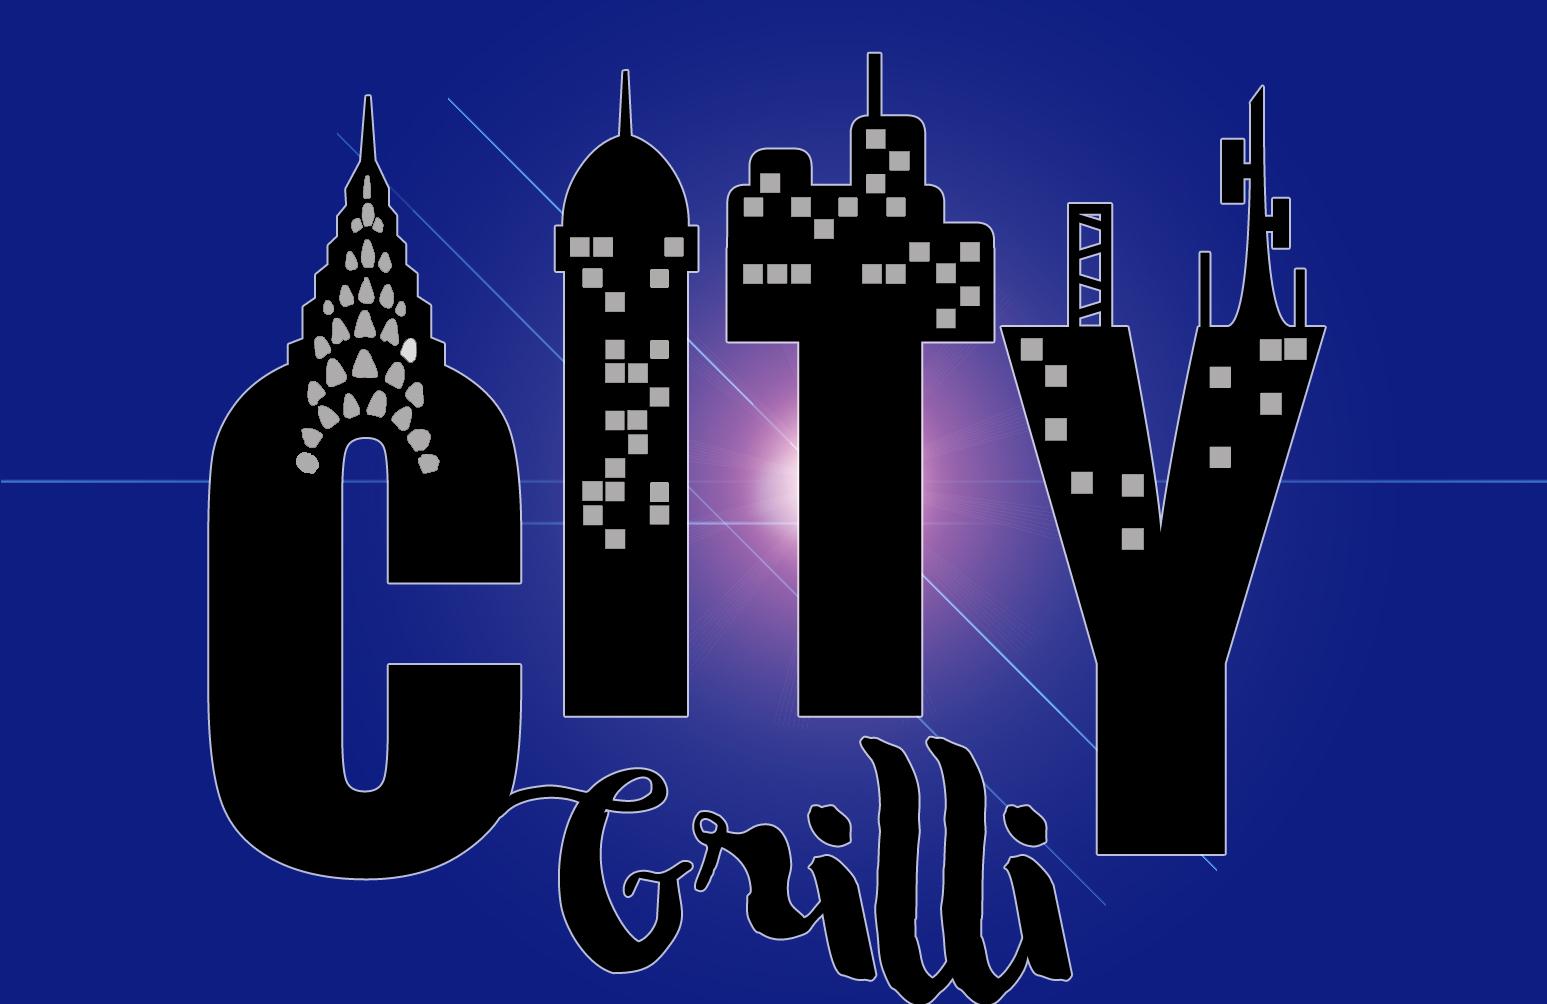 City Grilli